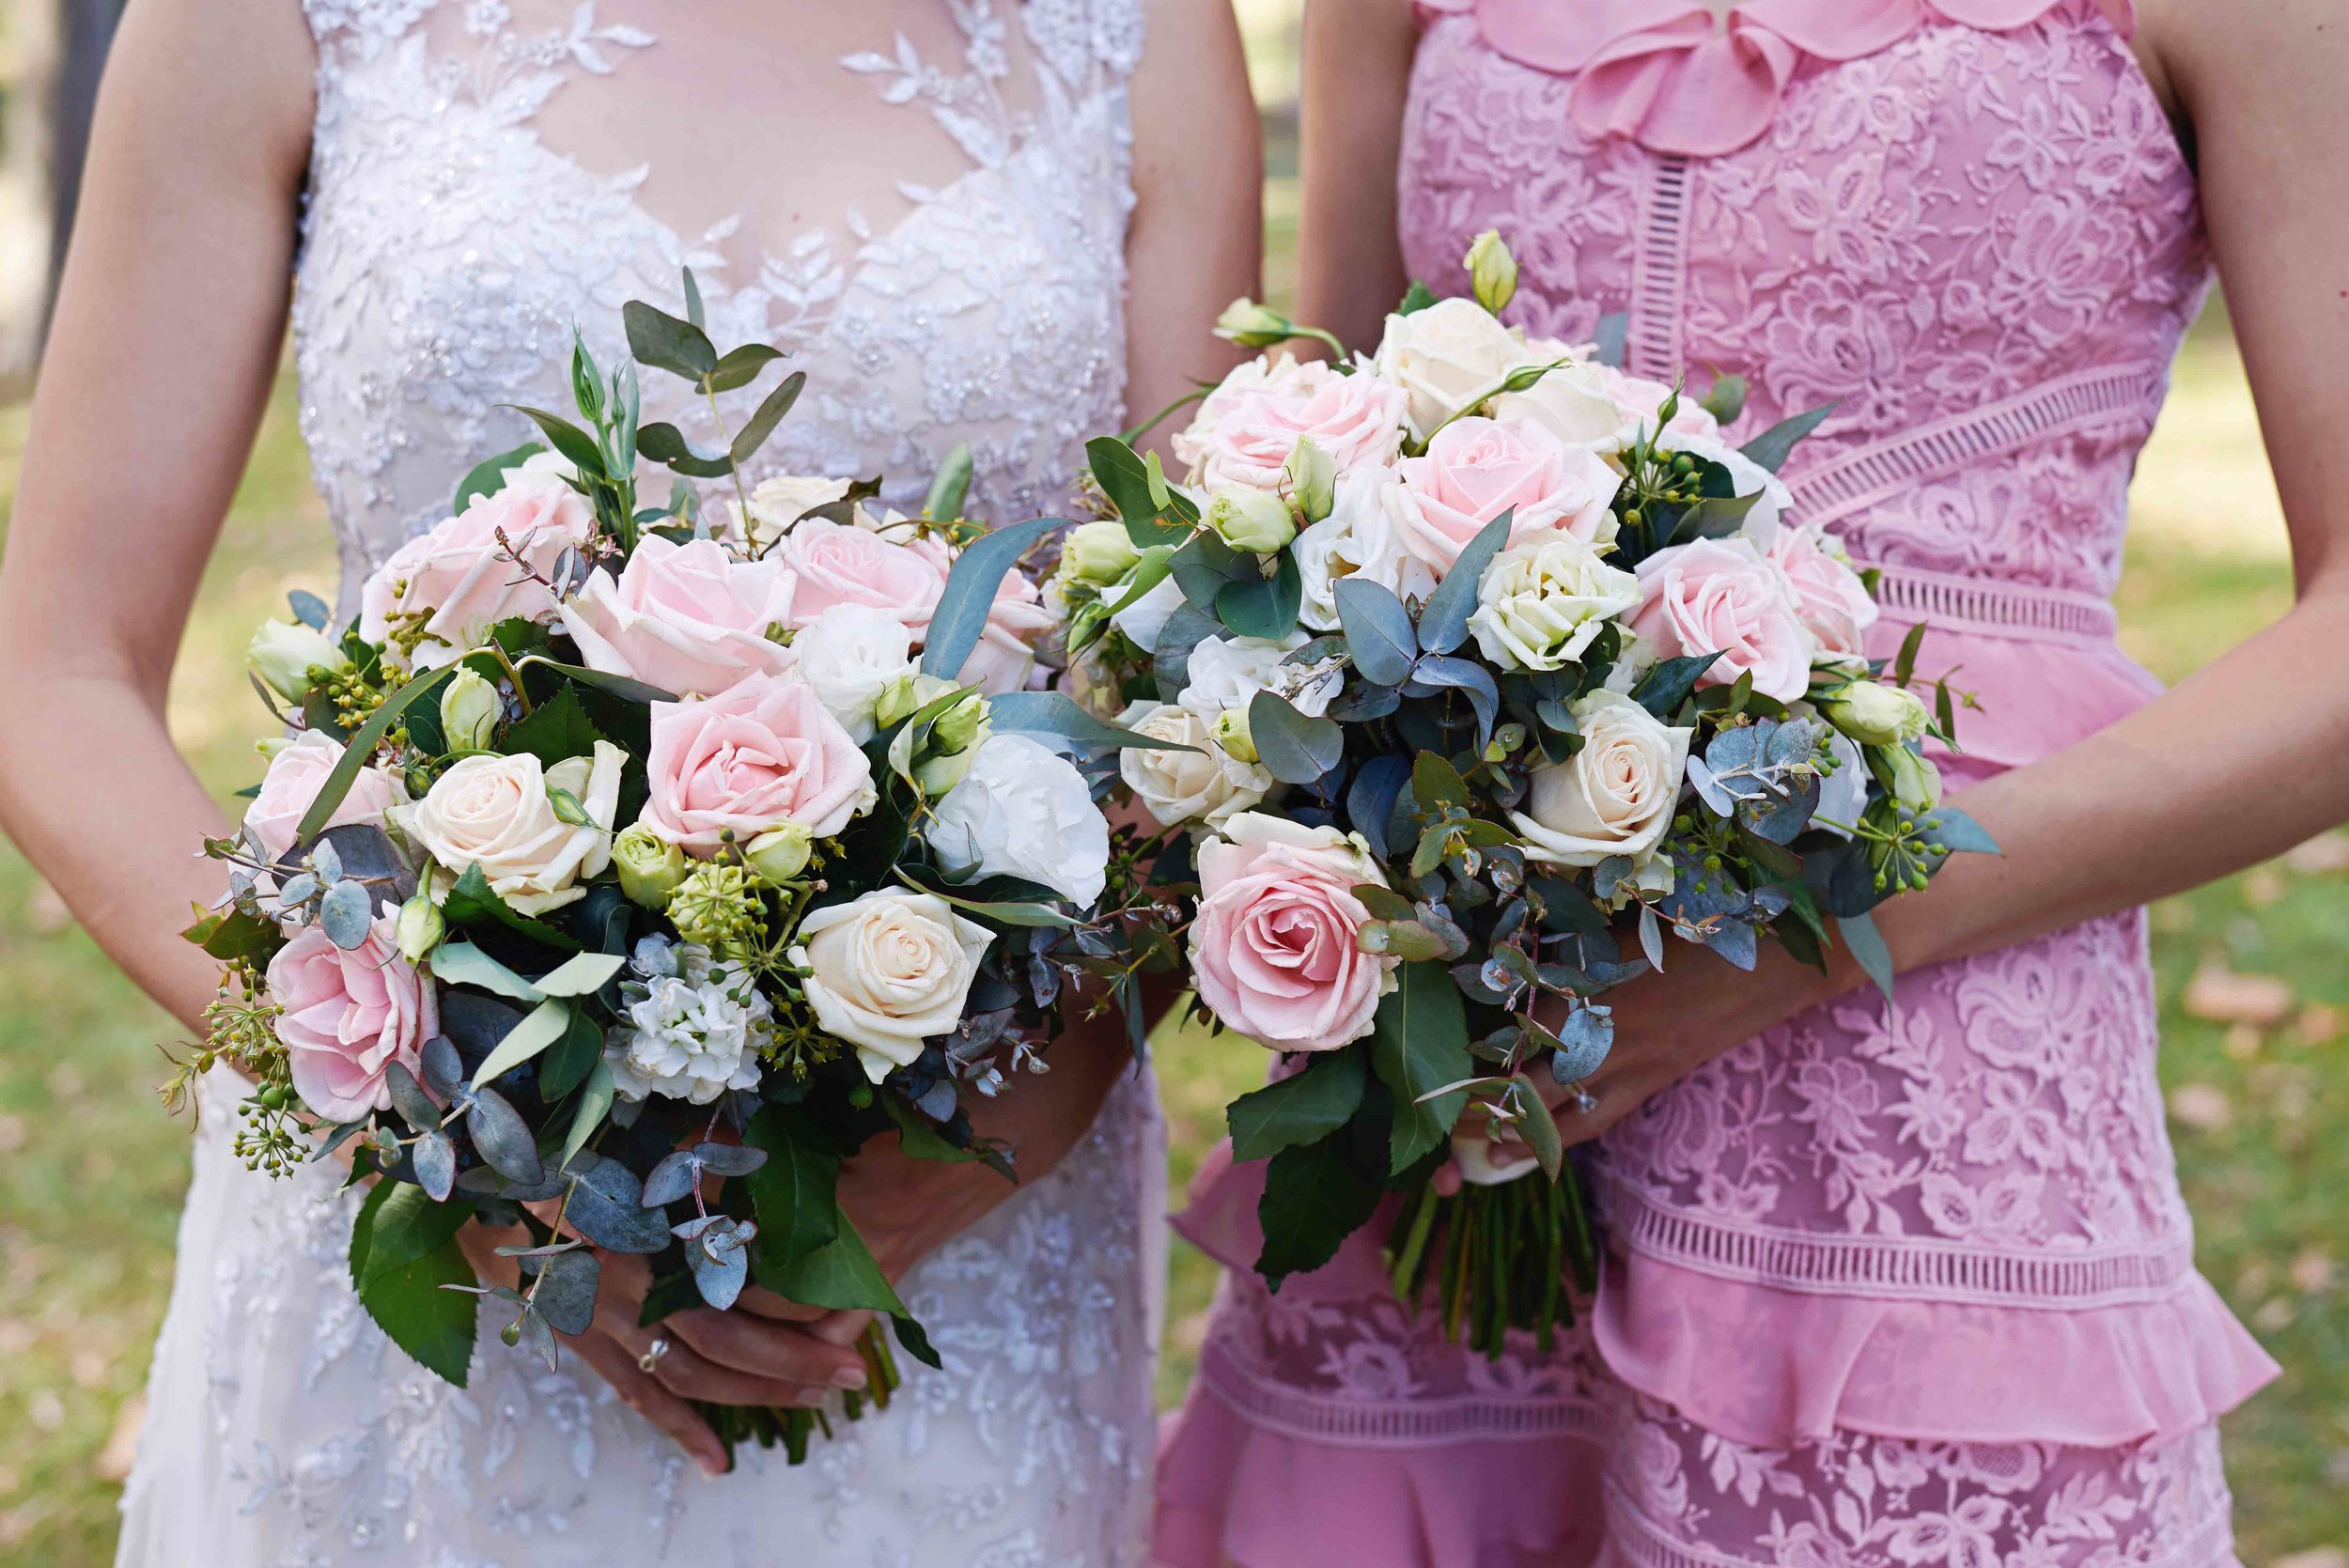 sorrento-wedding-photography-all-smiles-marissa-jade-photography-134.jpg